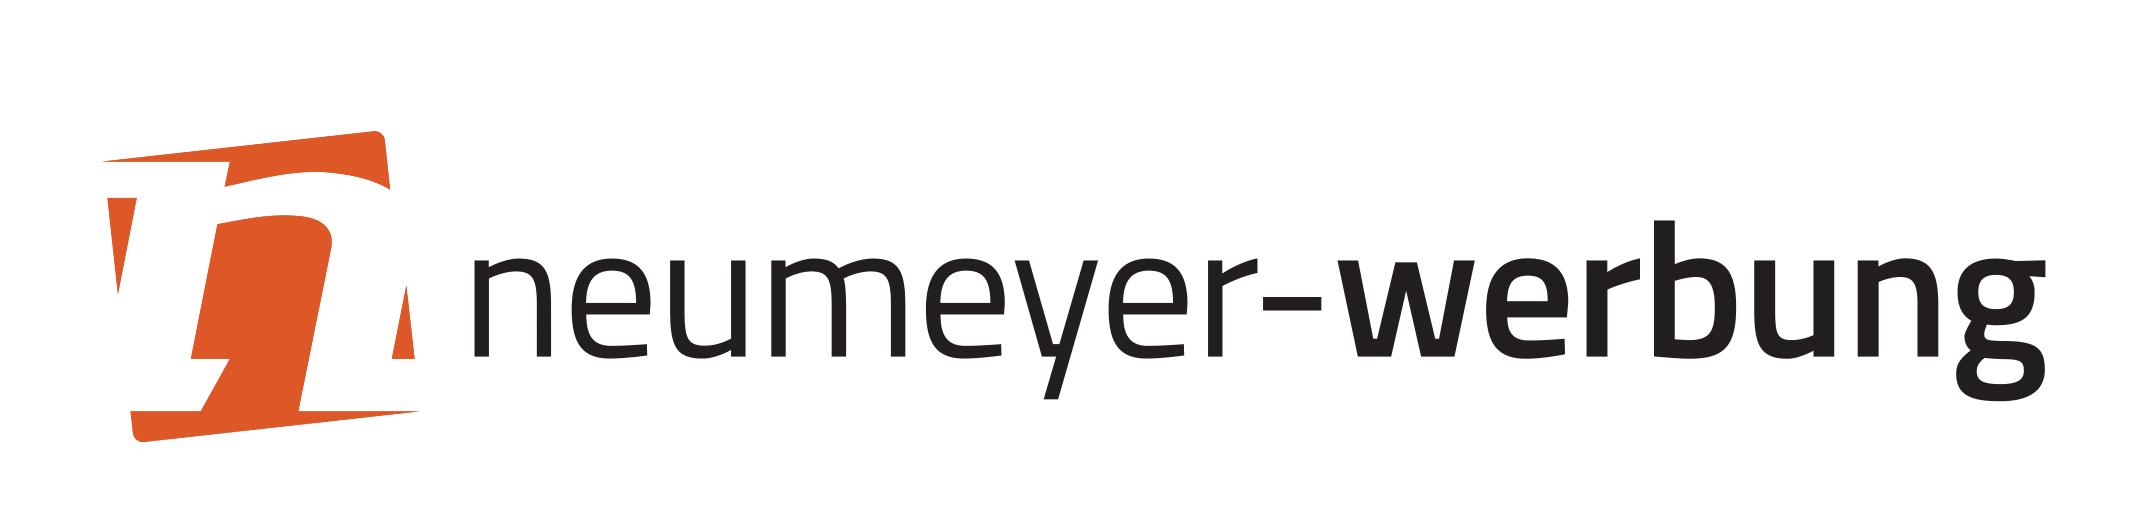 Neumeyer Werbung Logo